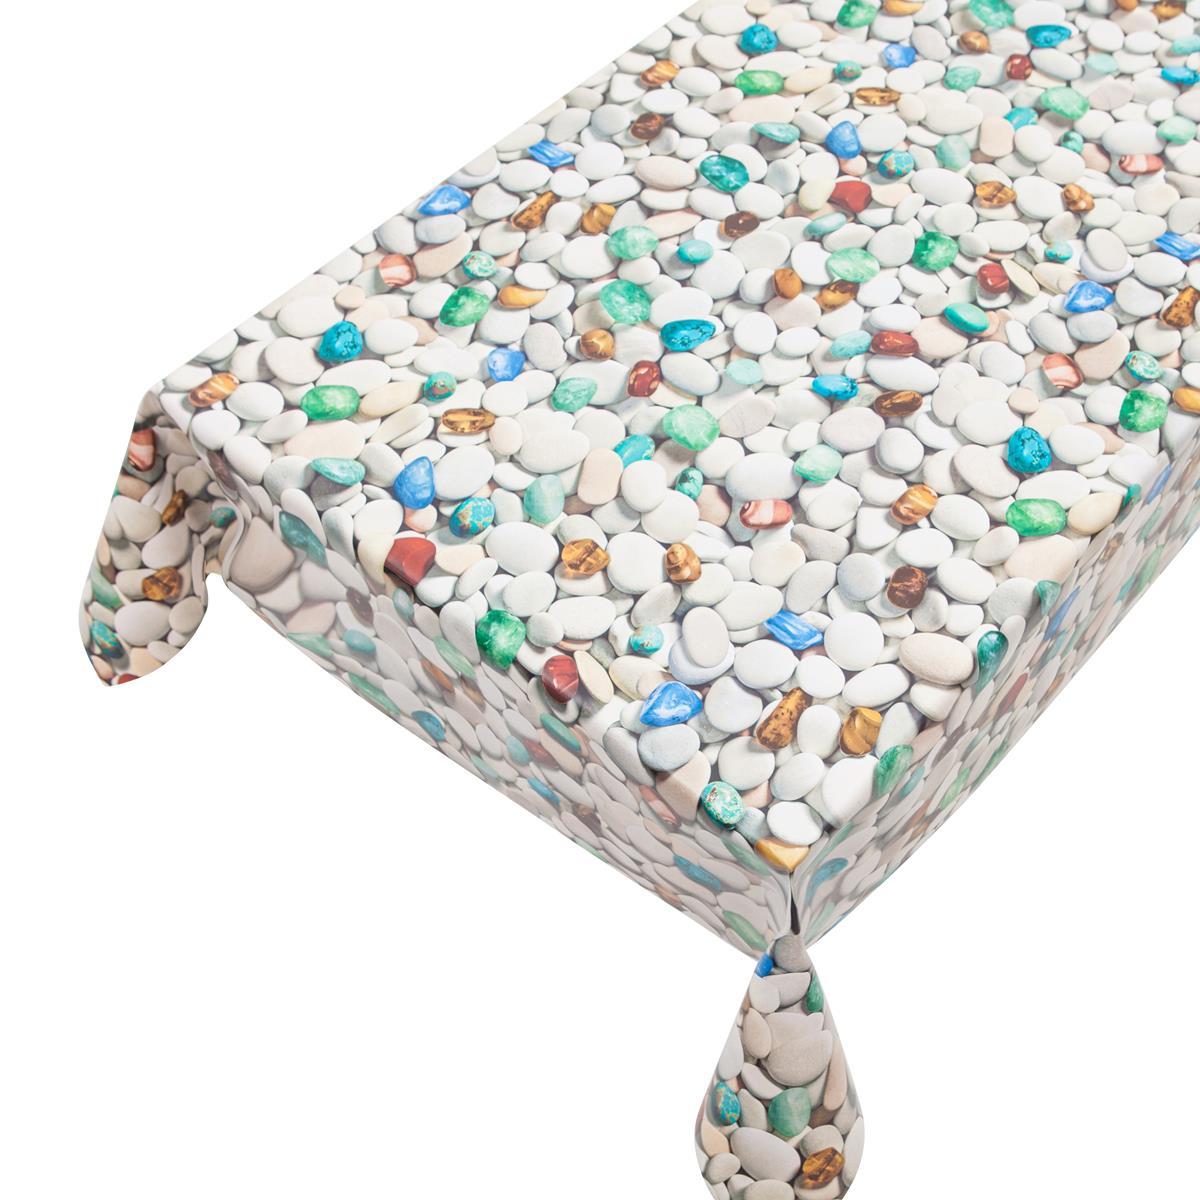 wachstuch in 1 4m br stones 2 meterware pvc outdoor tischdecke ebay. Black Bedroom Furniture Sets. Home Design Ideas